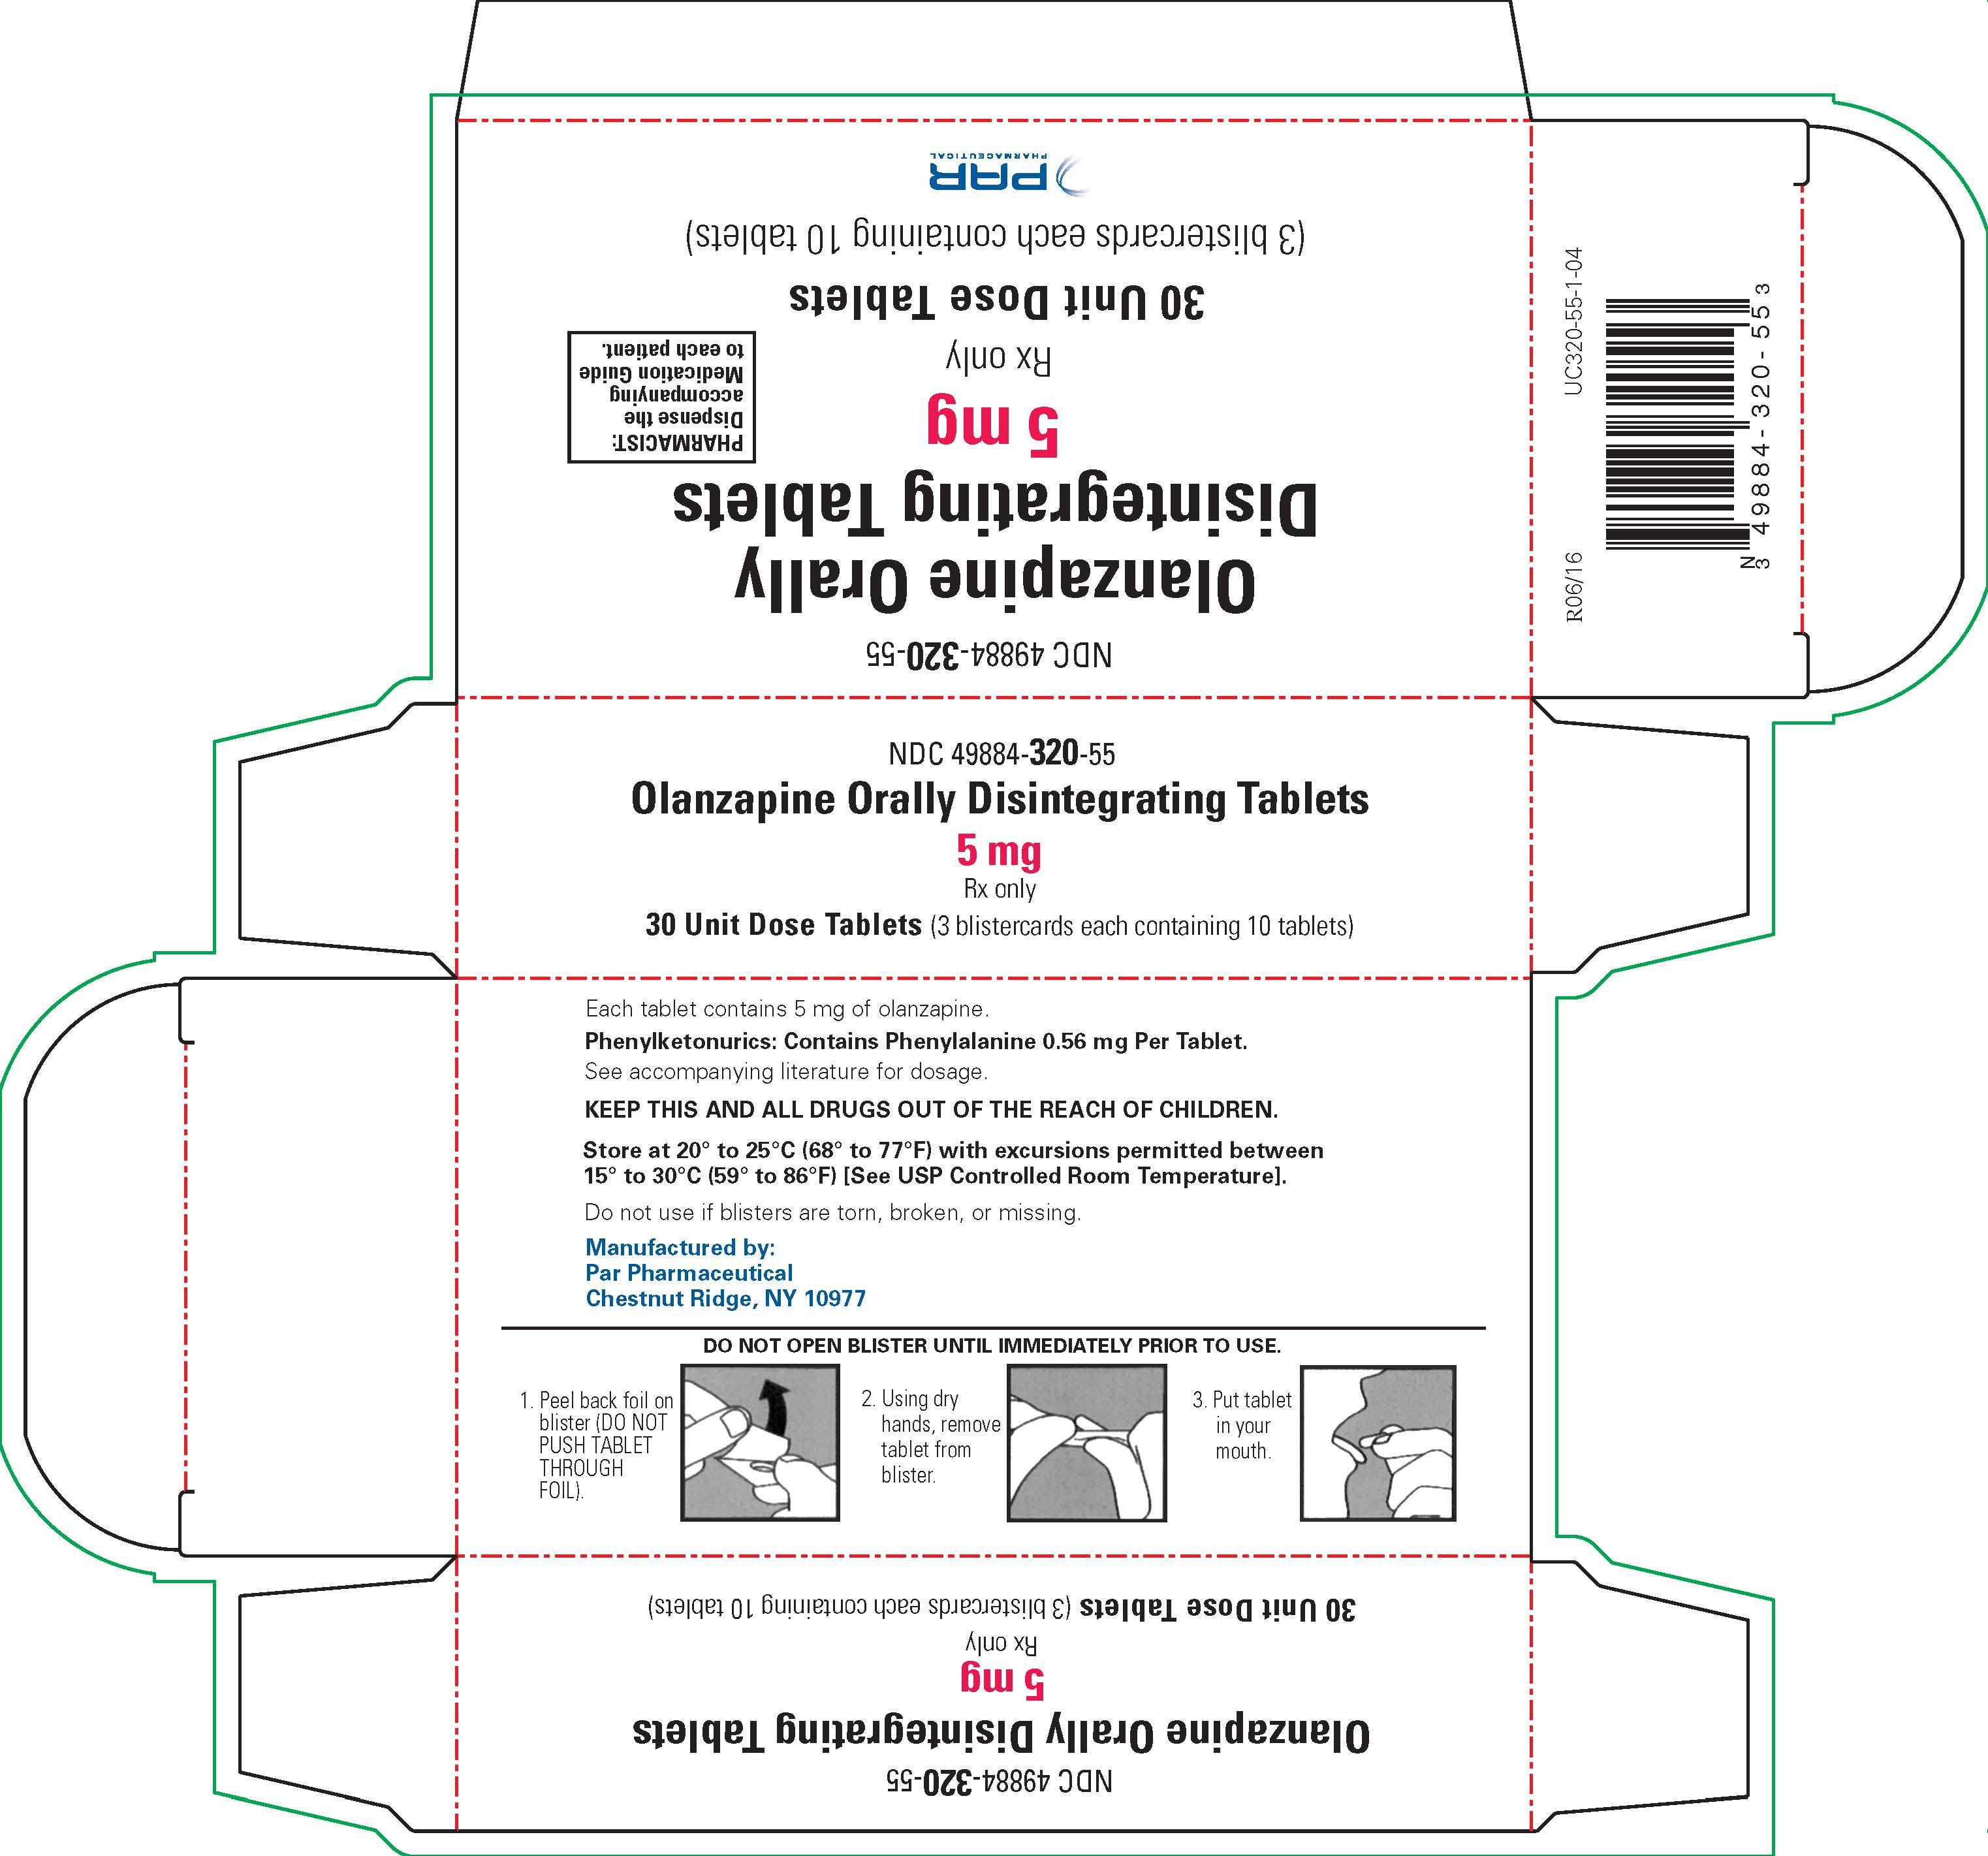 Olanzapine ODT 5 mg - Carton